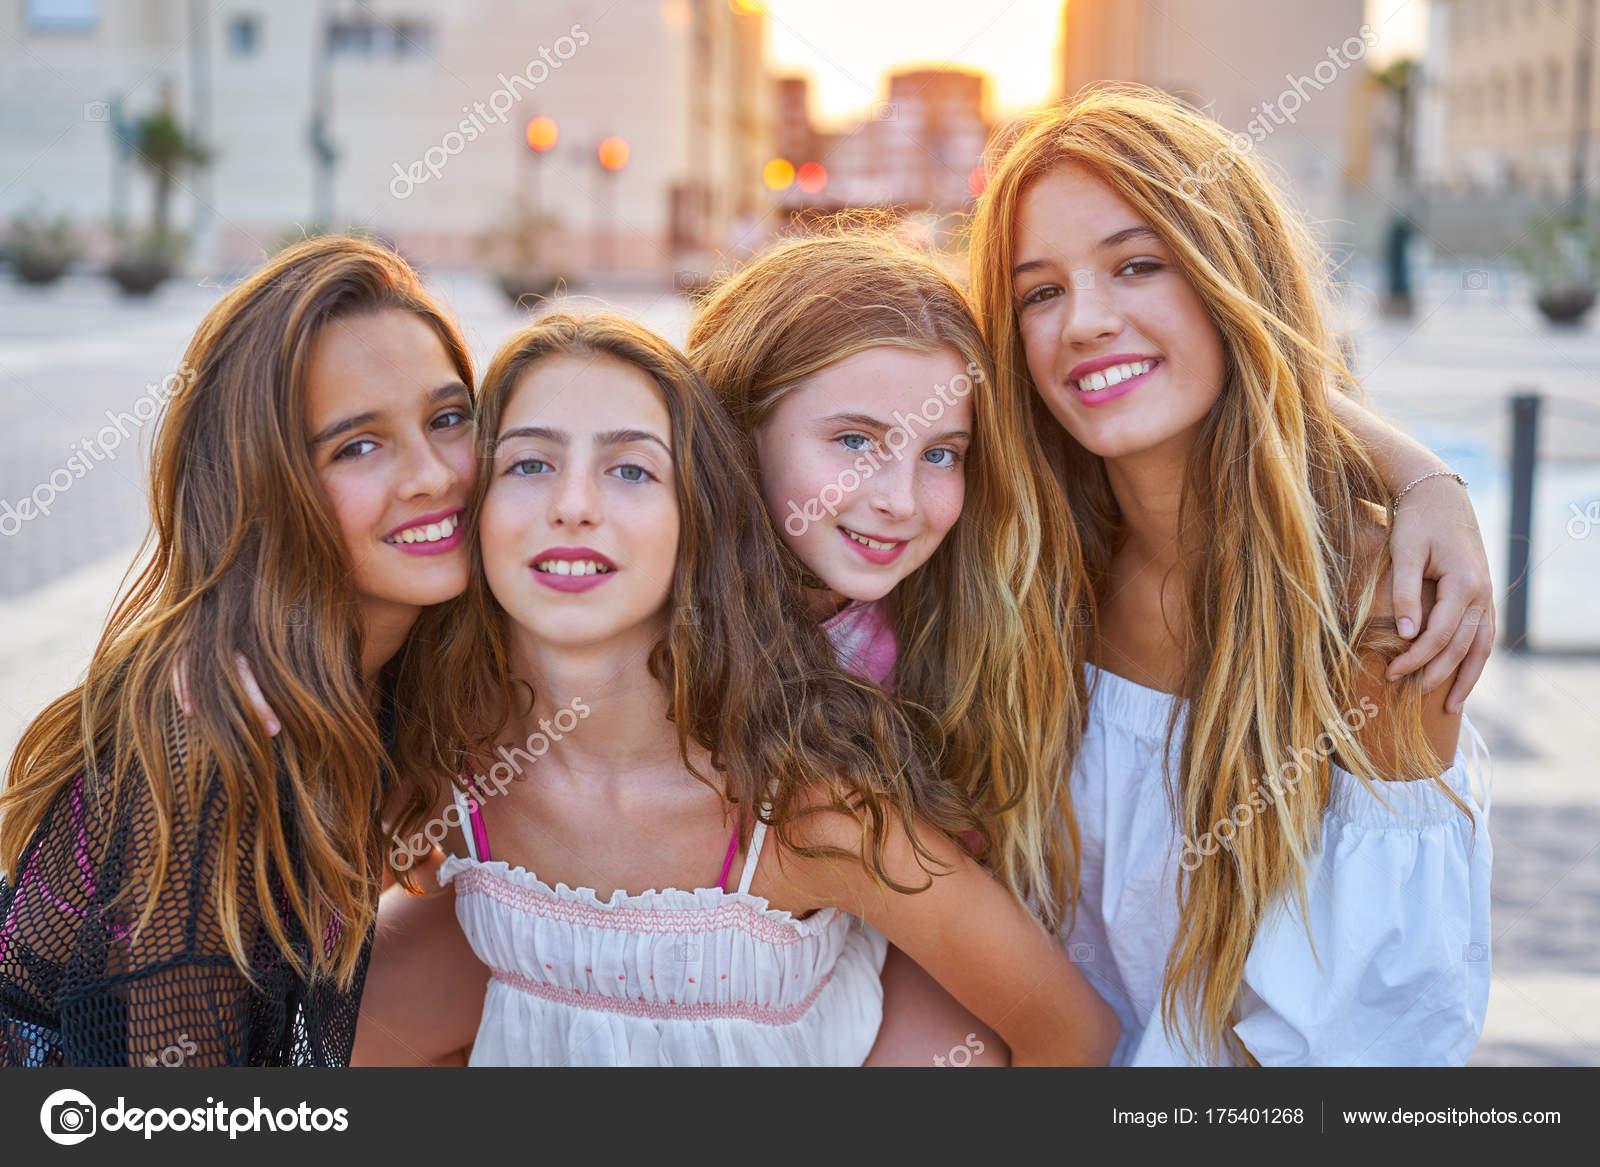 Beste Freunde Teen Girls Bei Sonnenuntergang In Der Stadt Stockbild